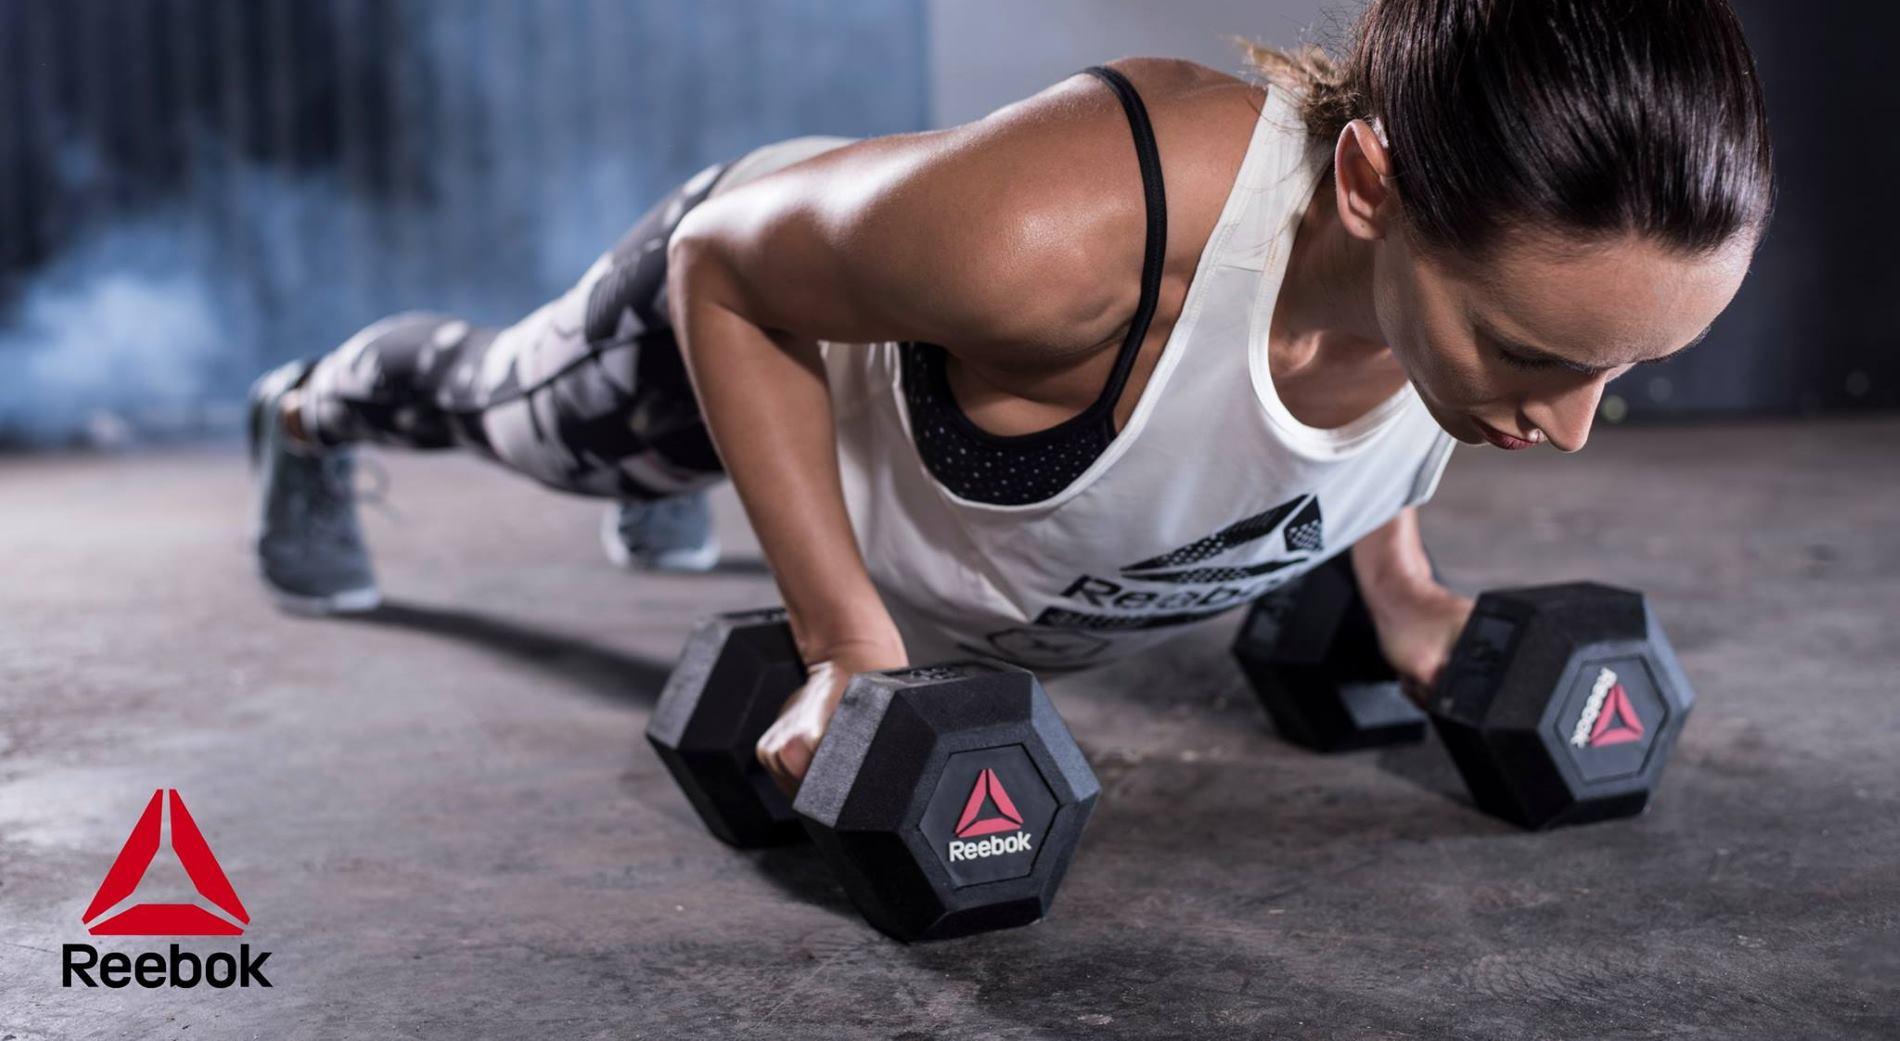 FOTO: VIDEO: Reebok Crafted by Fitness predstavlja REEBOK LUX TIGHTS i REEBOK EPIC SHORTS